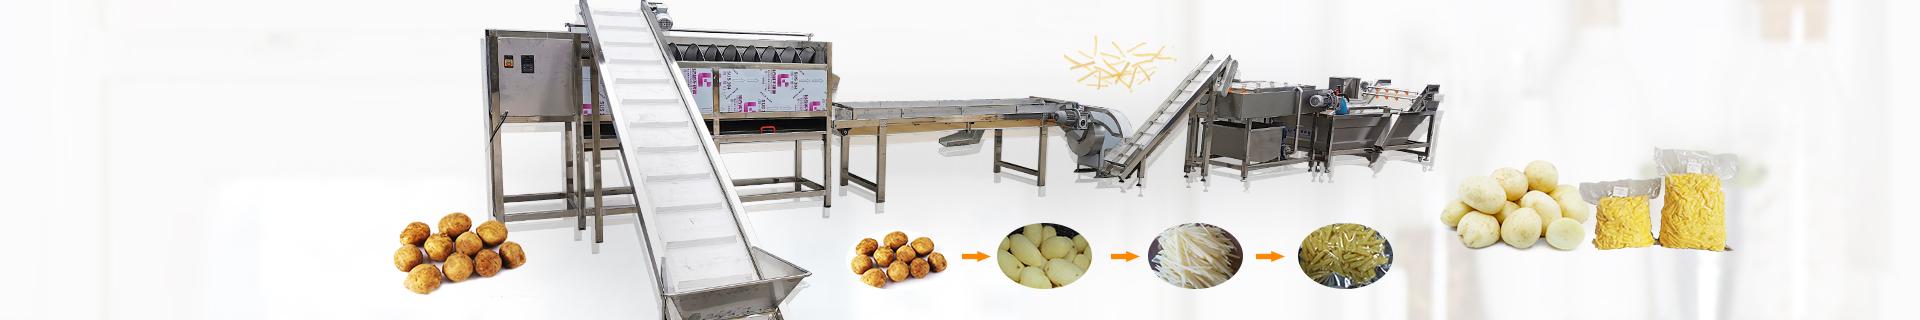 ContactUs-Foodprocessingmachine